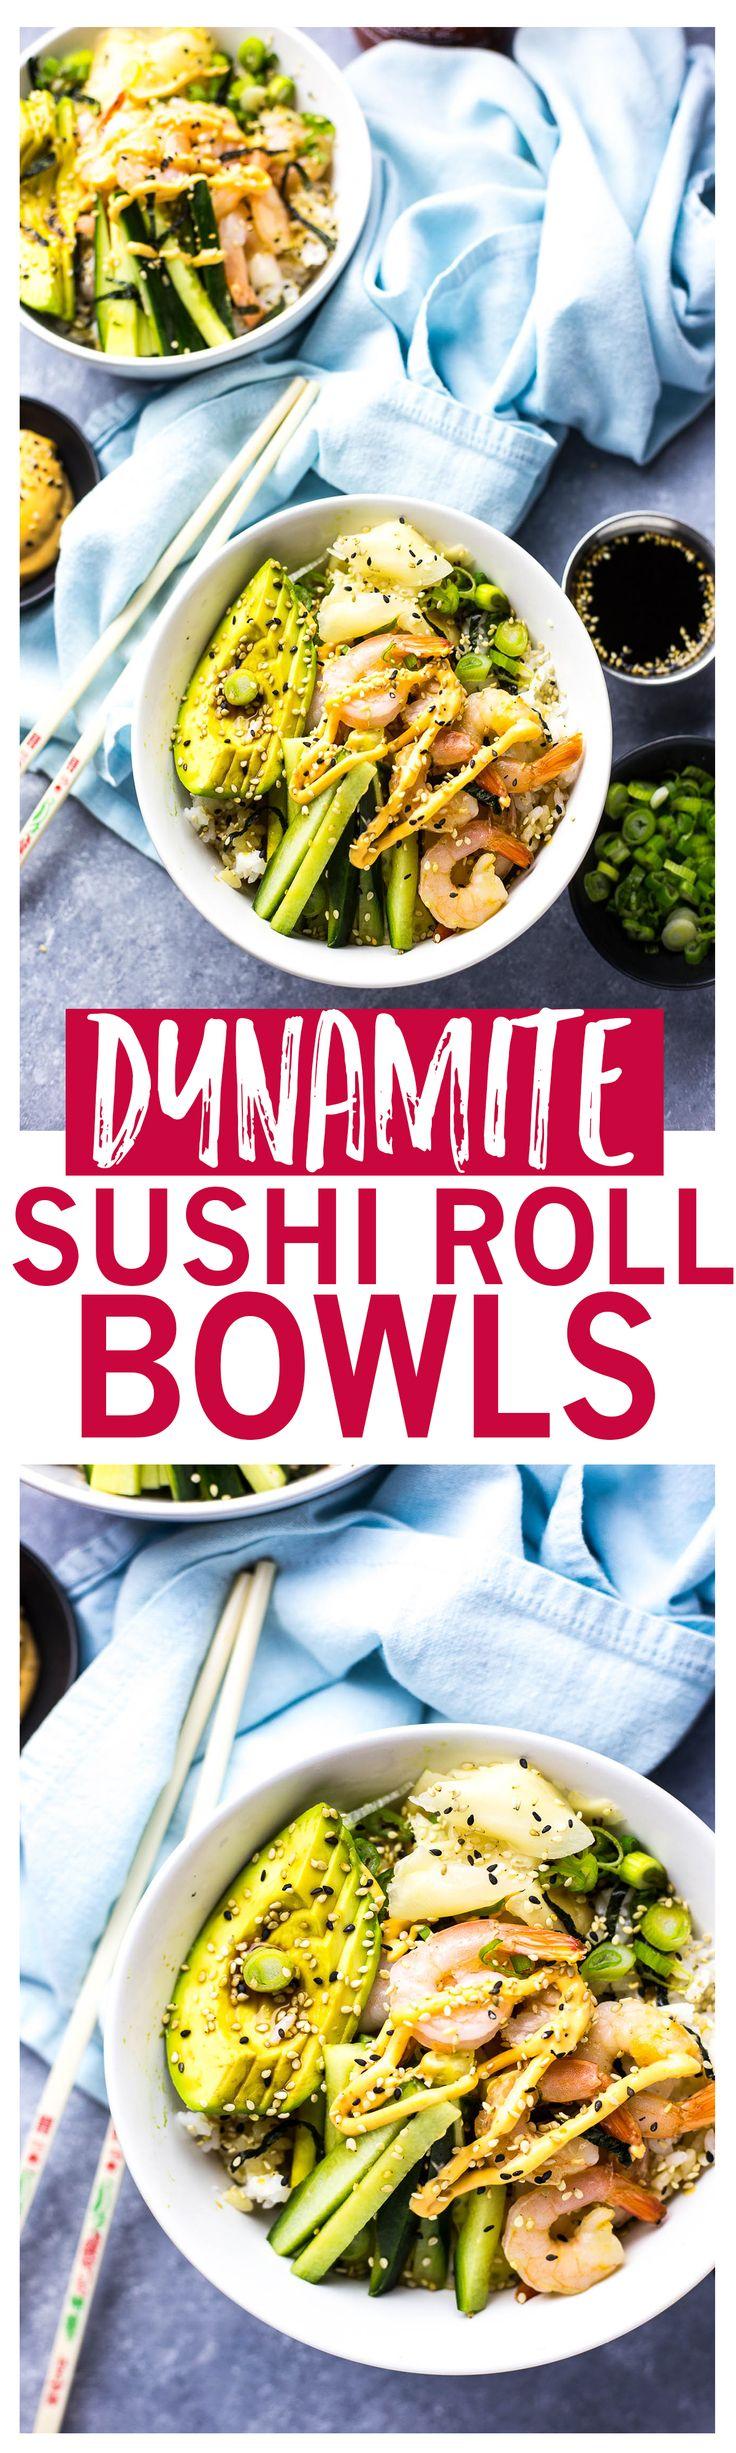 Shrimp Dynamite Sushi Bowls | Healthy 20-minute grain bowl | Gluten free